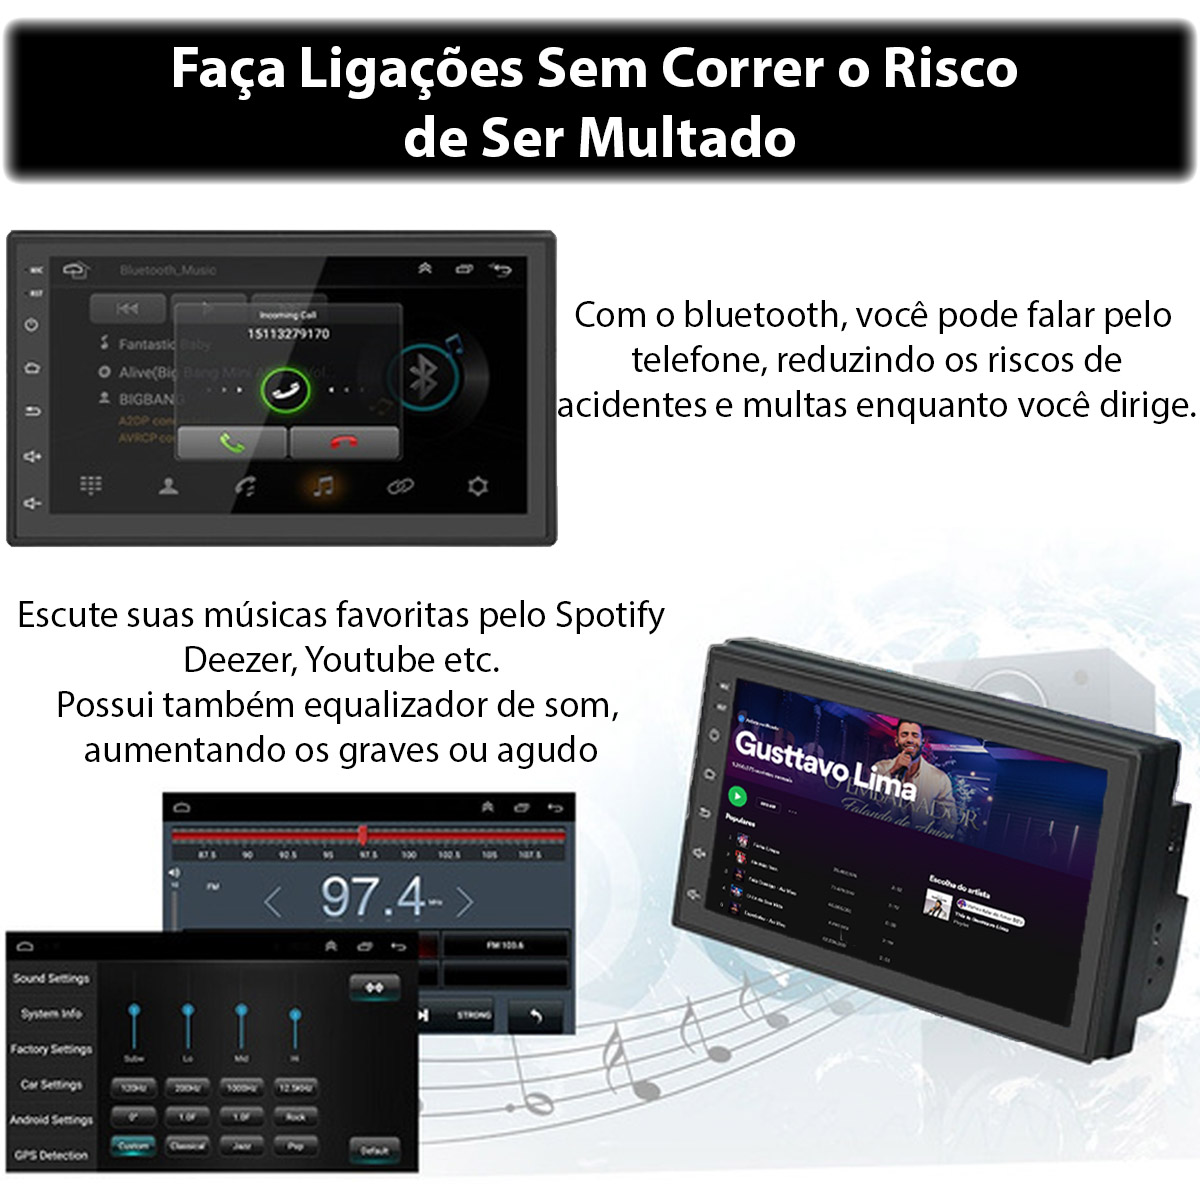 Central Multimidia com Moldura Volkswagen Gol G3 Mp5 Bluetooth Usb Touchscreen 7 Polegadas 2 Din Poliparts